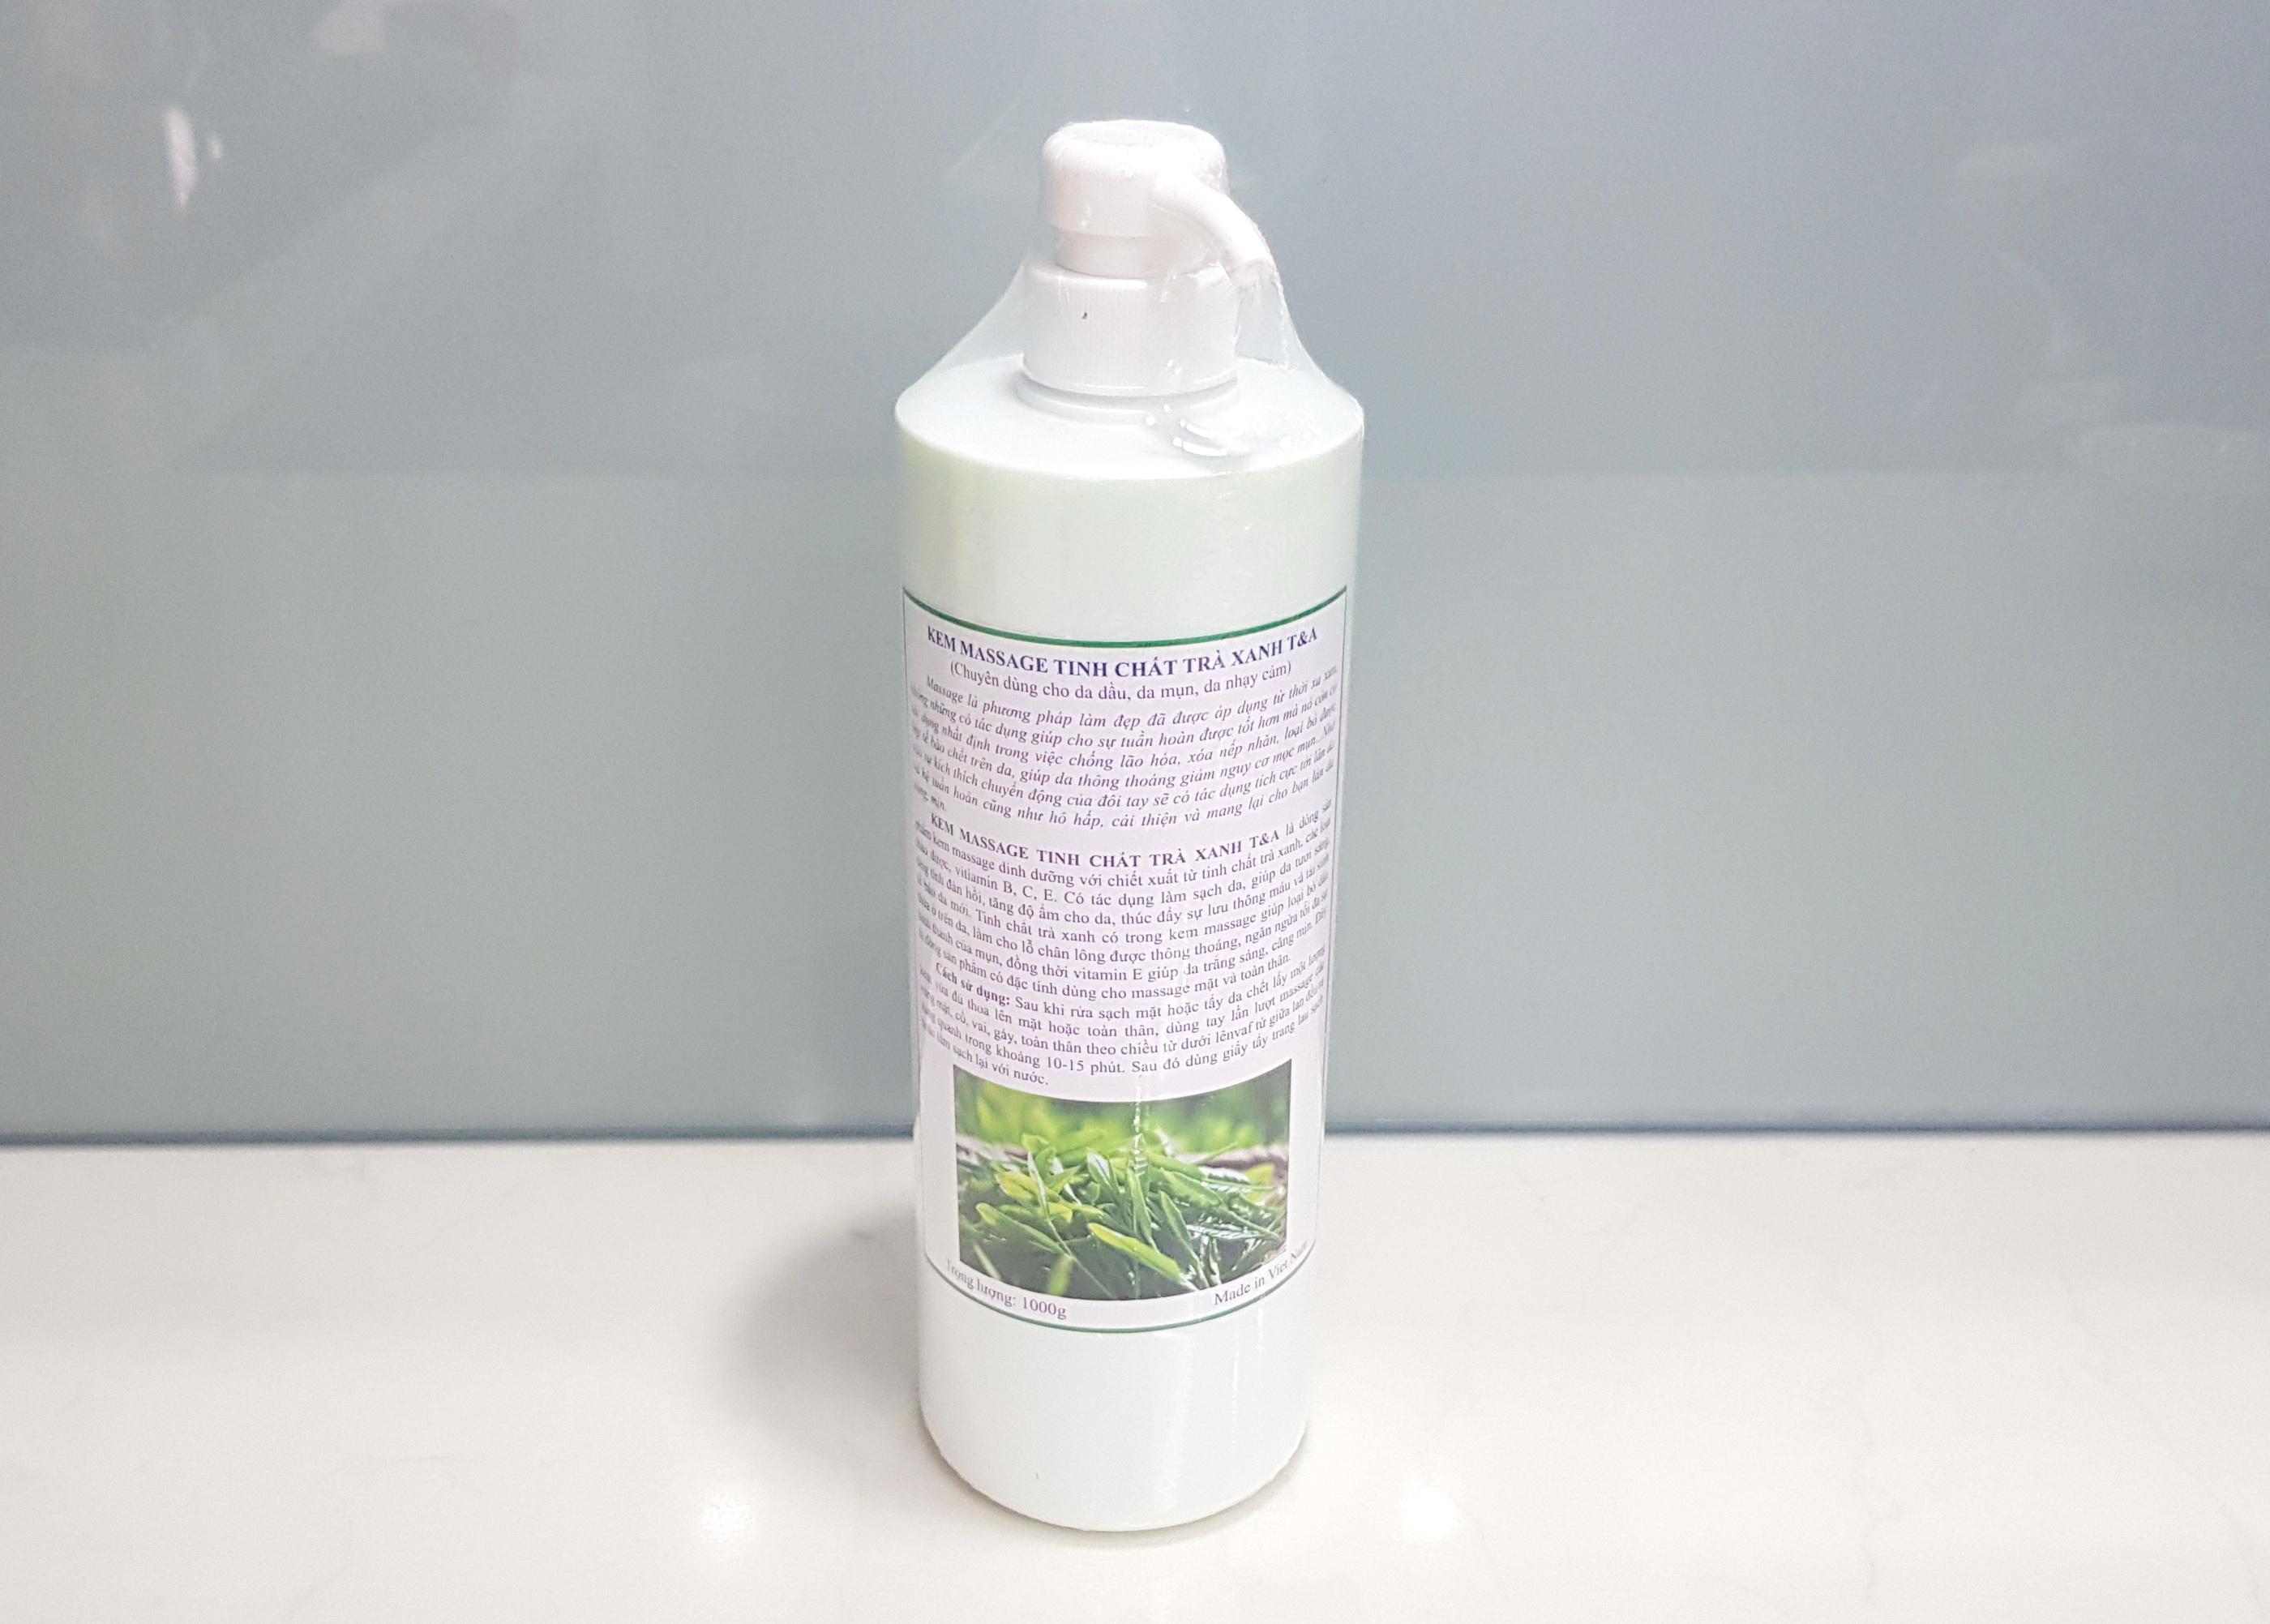 Kem massage tinh chất trà xanh, dùng cho da dầu, da mụn, da nhạy cảm